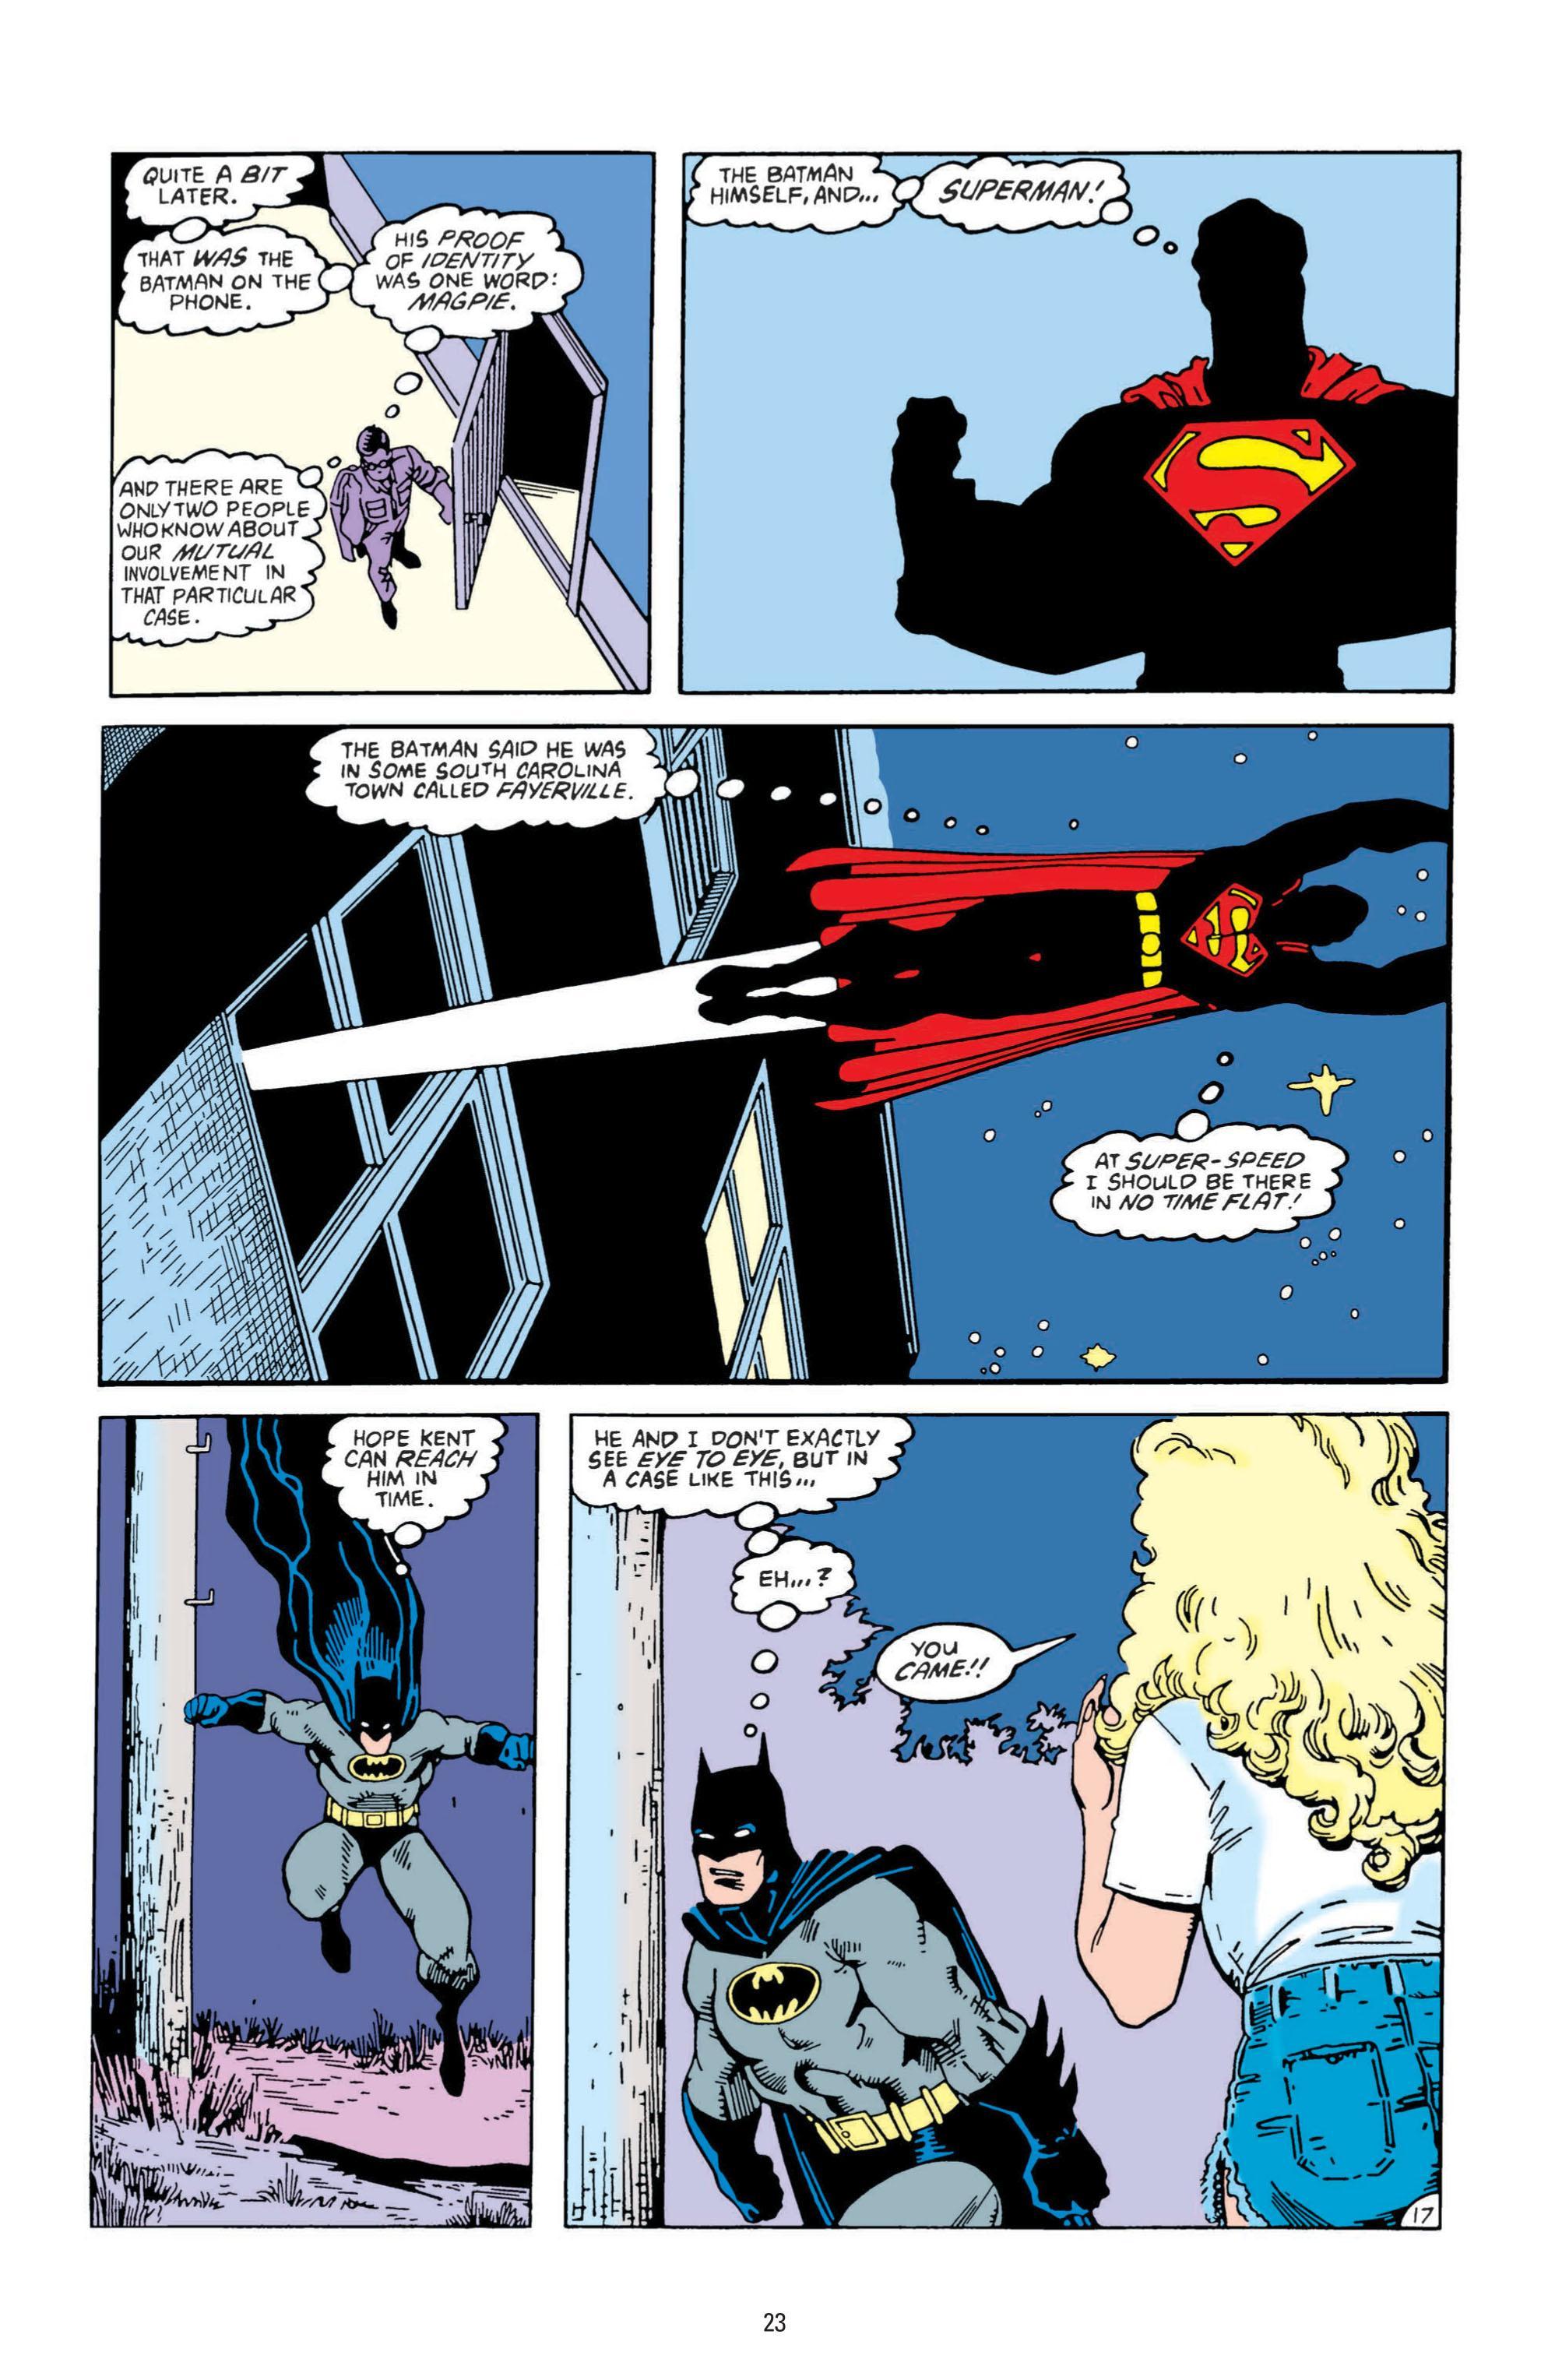 Superman Dark Knight Over Metropolis review